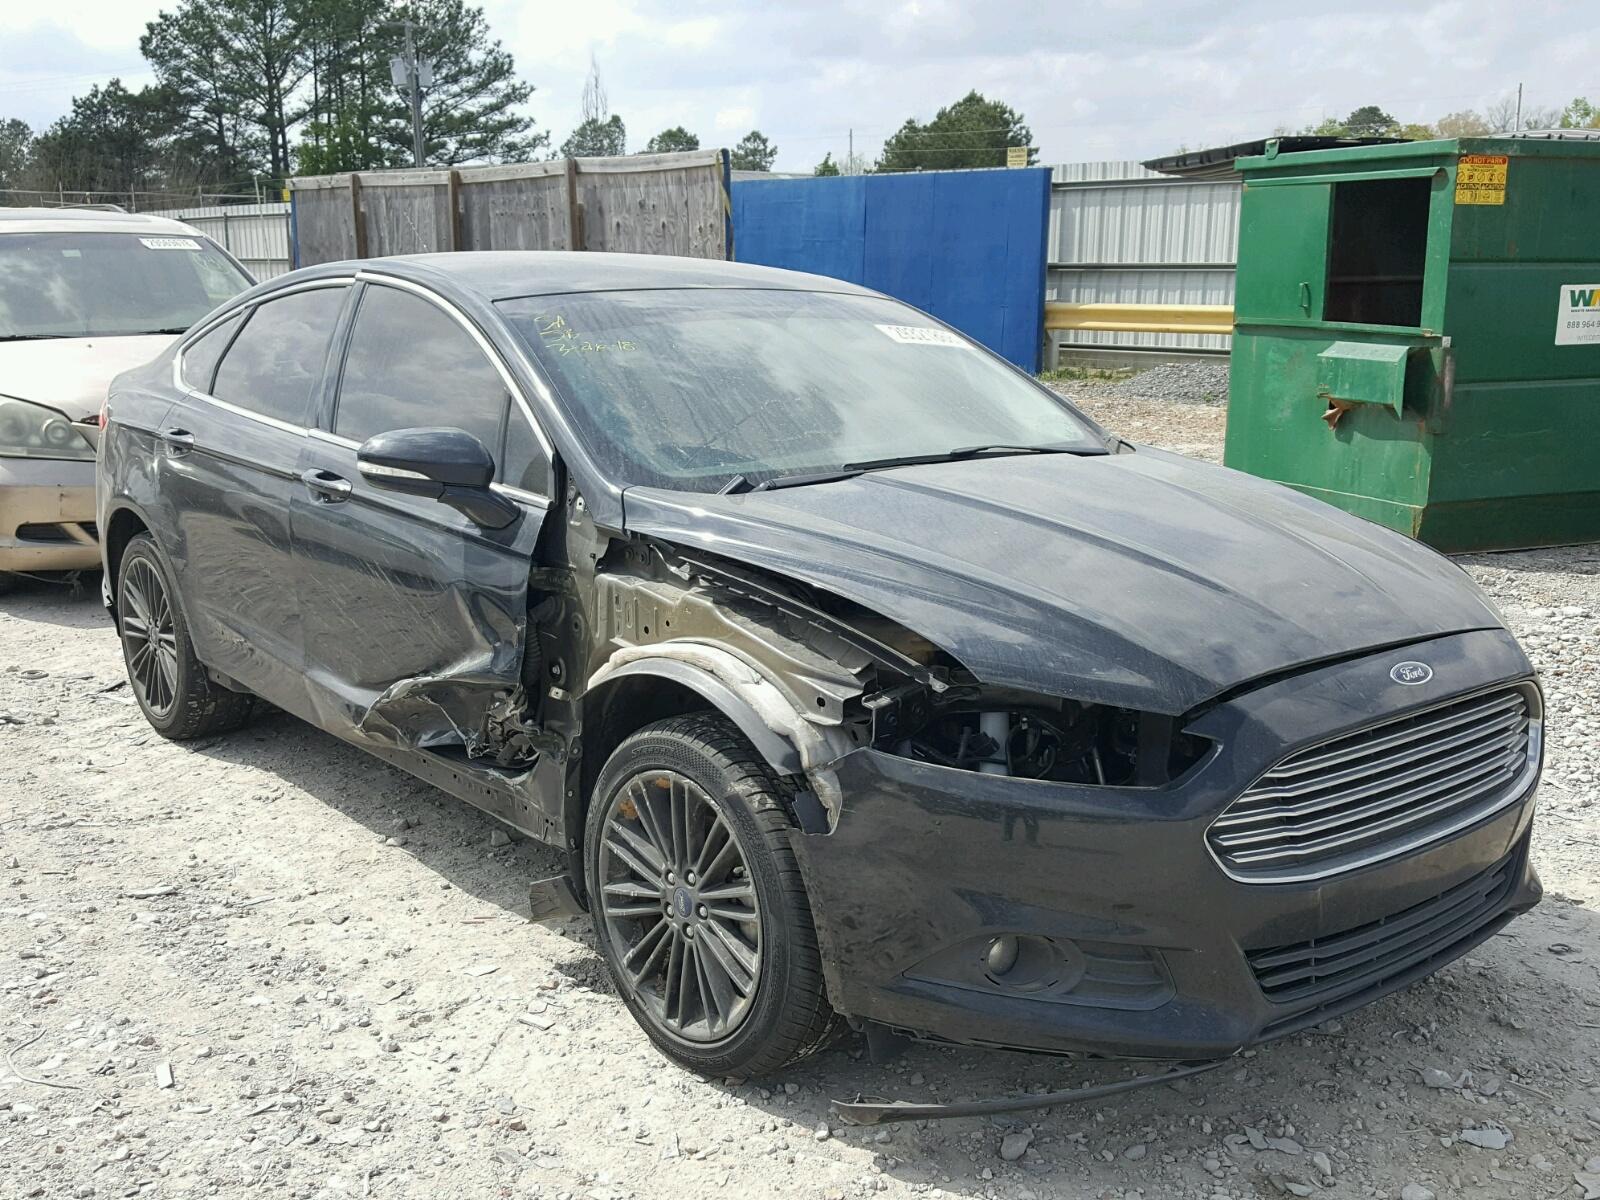 3fa6p0hd6er217269 2014 Black Ford Fusion Se On Sale In Ms 15l Left View